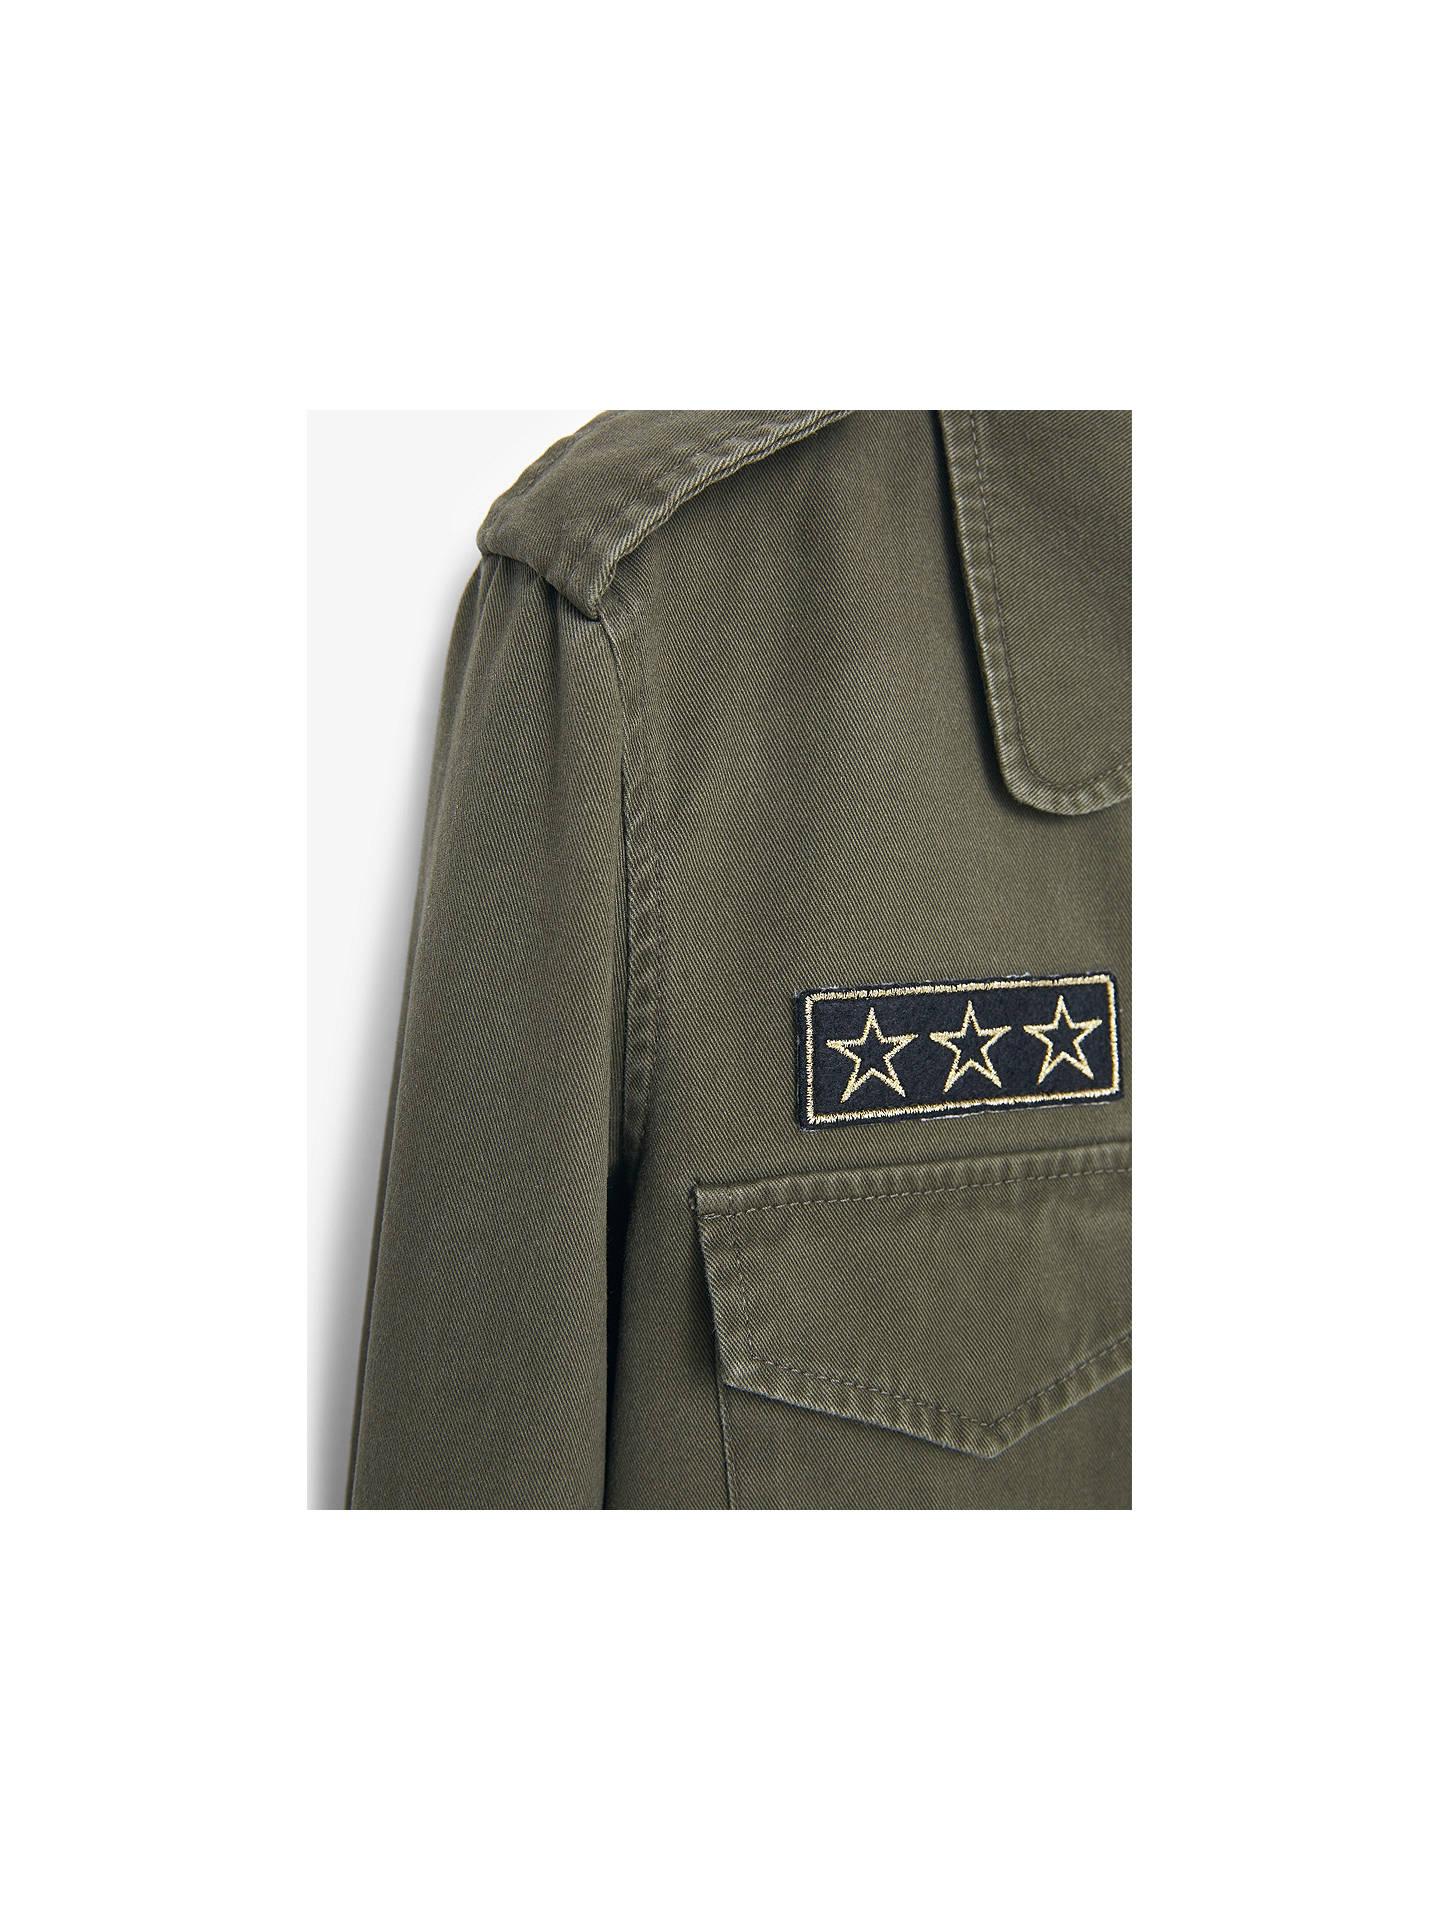 8aa262fe6 Mango Military Style Trench Coat, Khaki at John Lewis & Partners